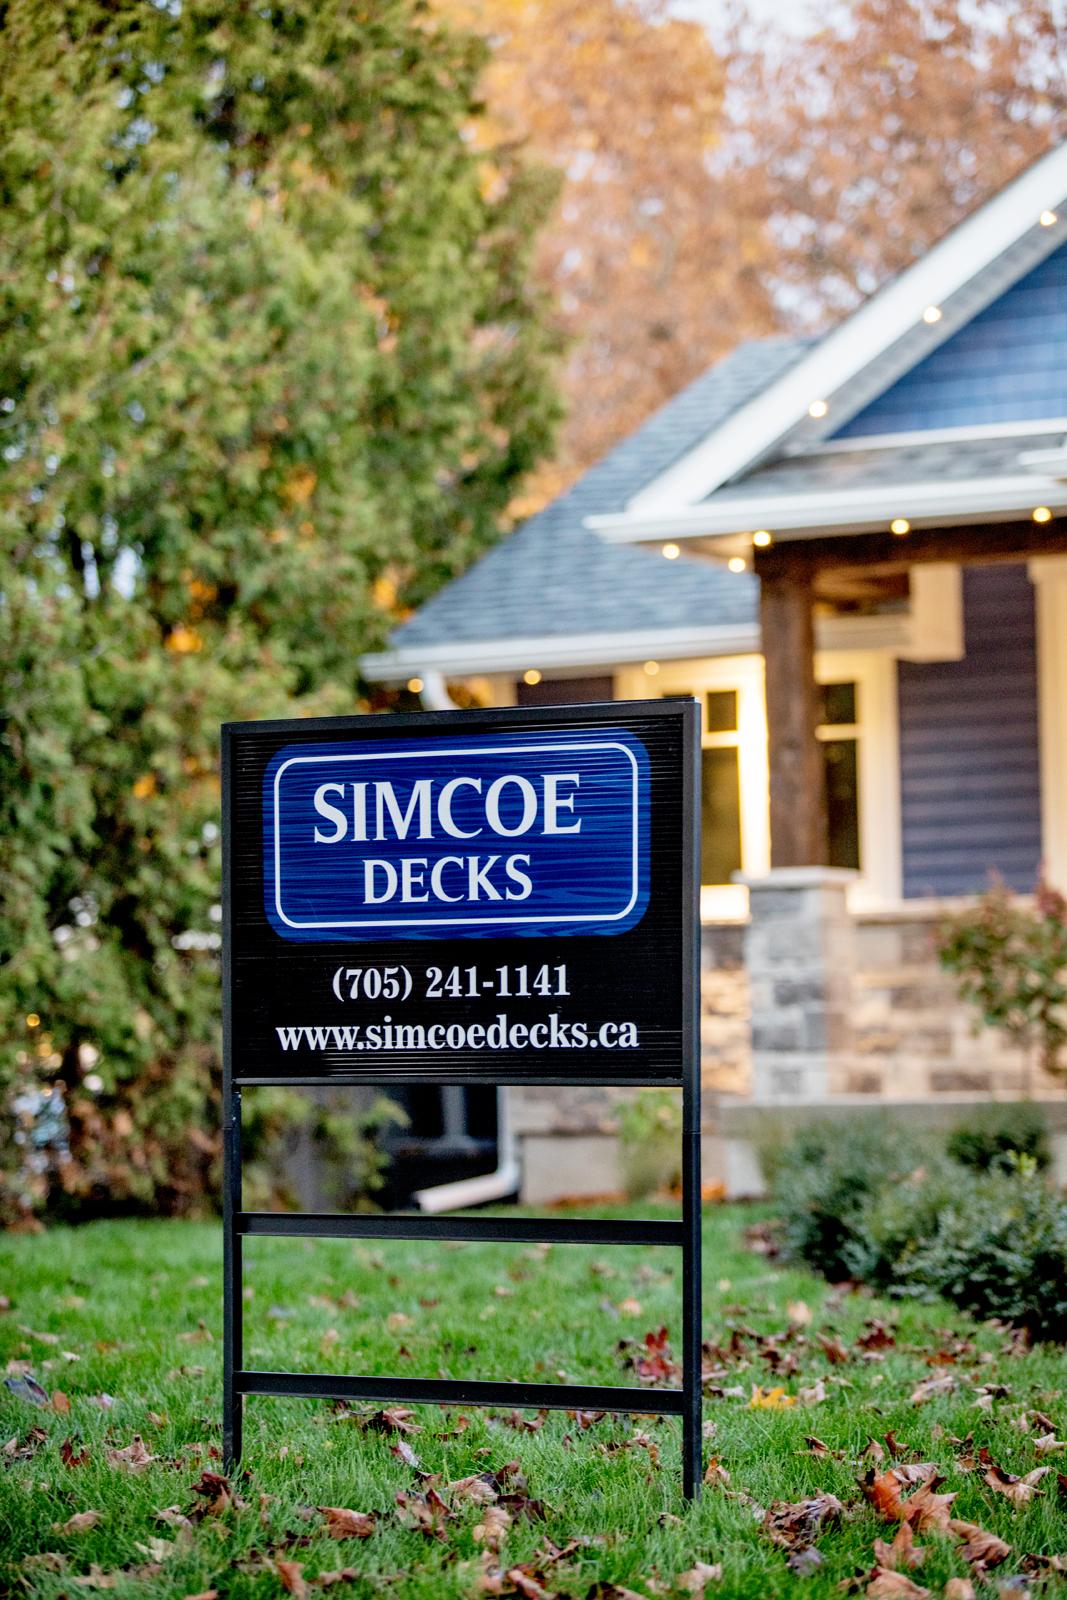 Simcoe Decks Yard Sign